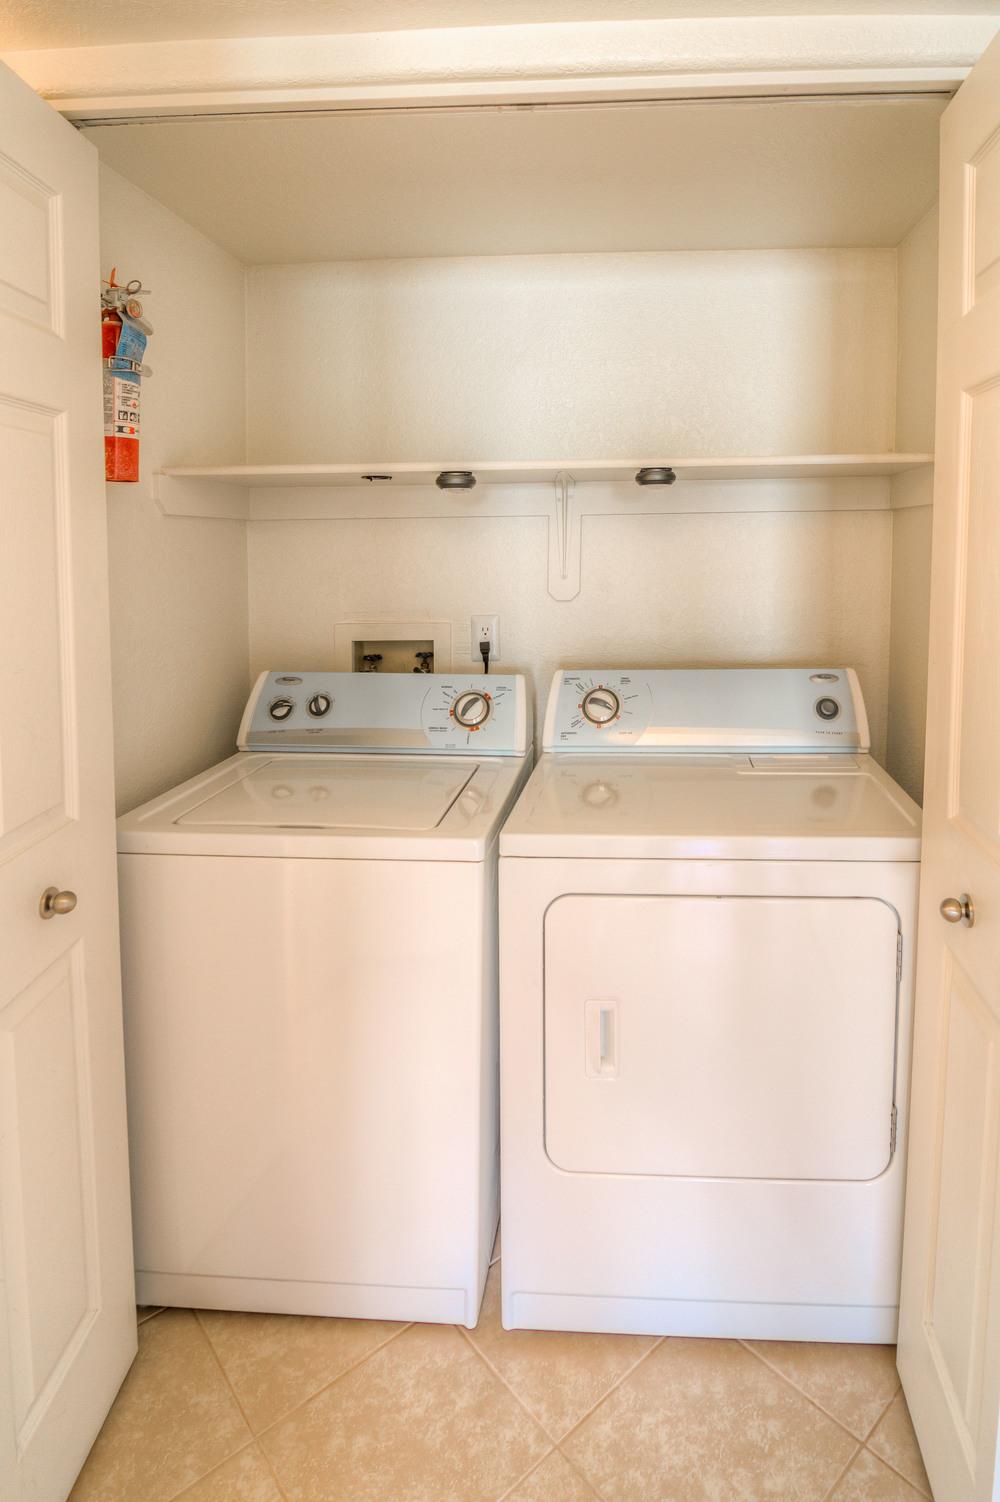 38 Laundry.jpg